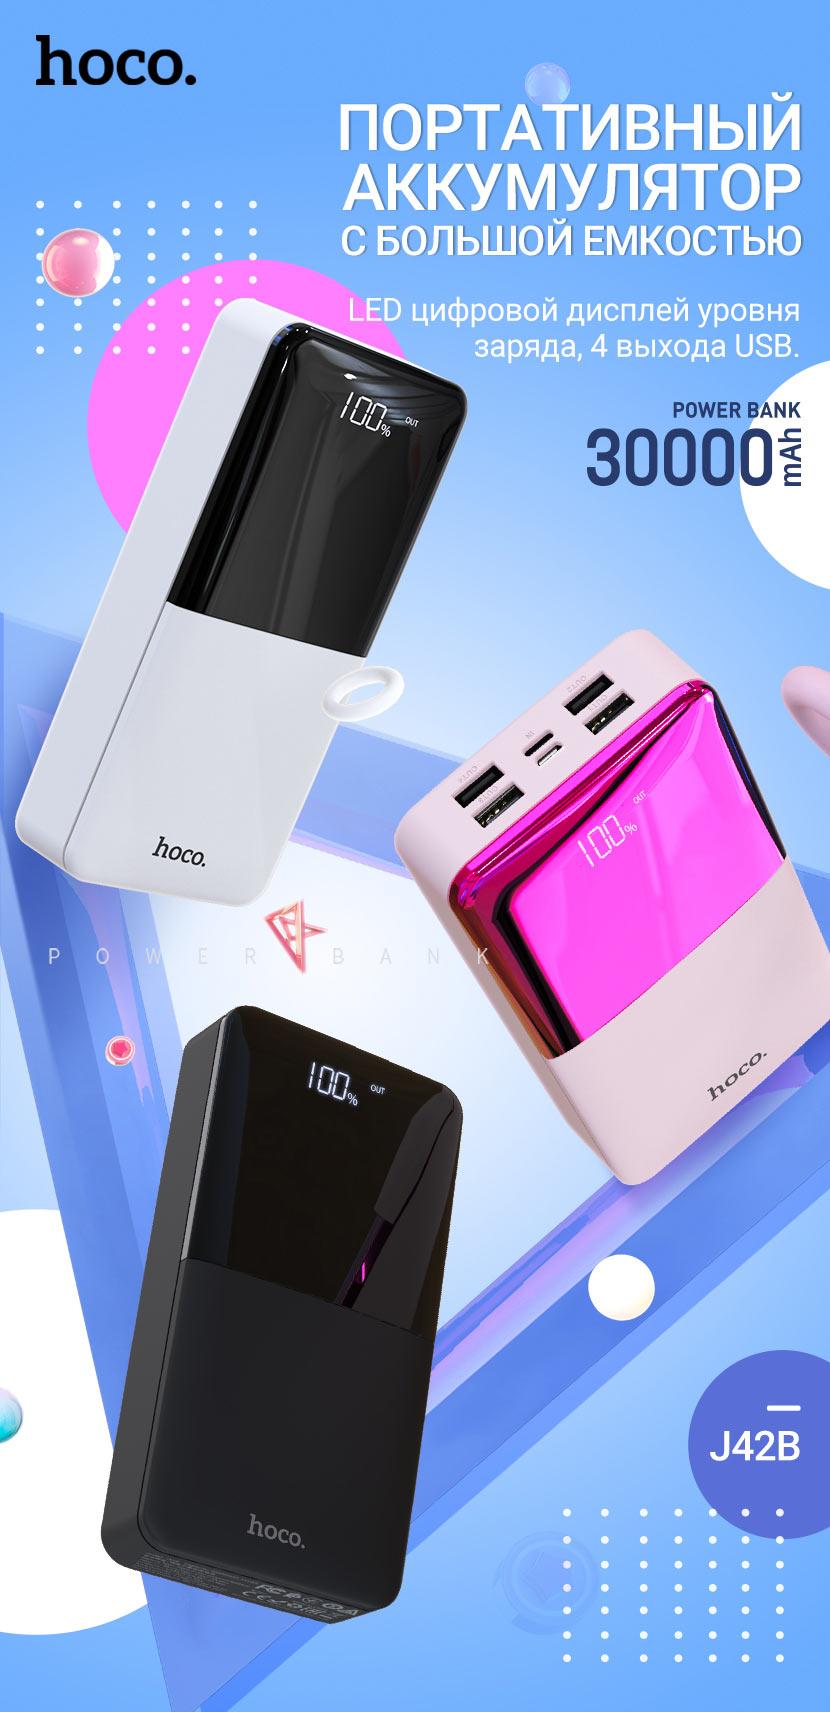 hoco news j42b high power mobile power bank 30000mah ru